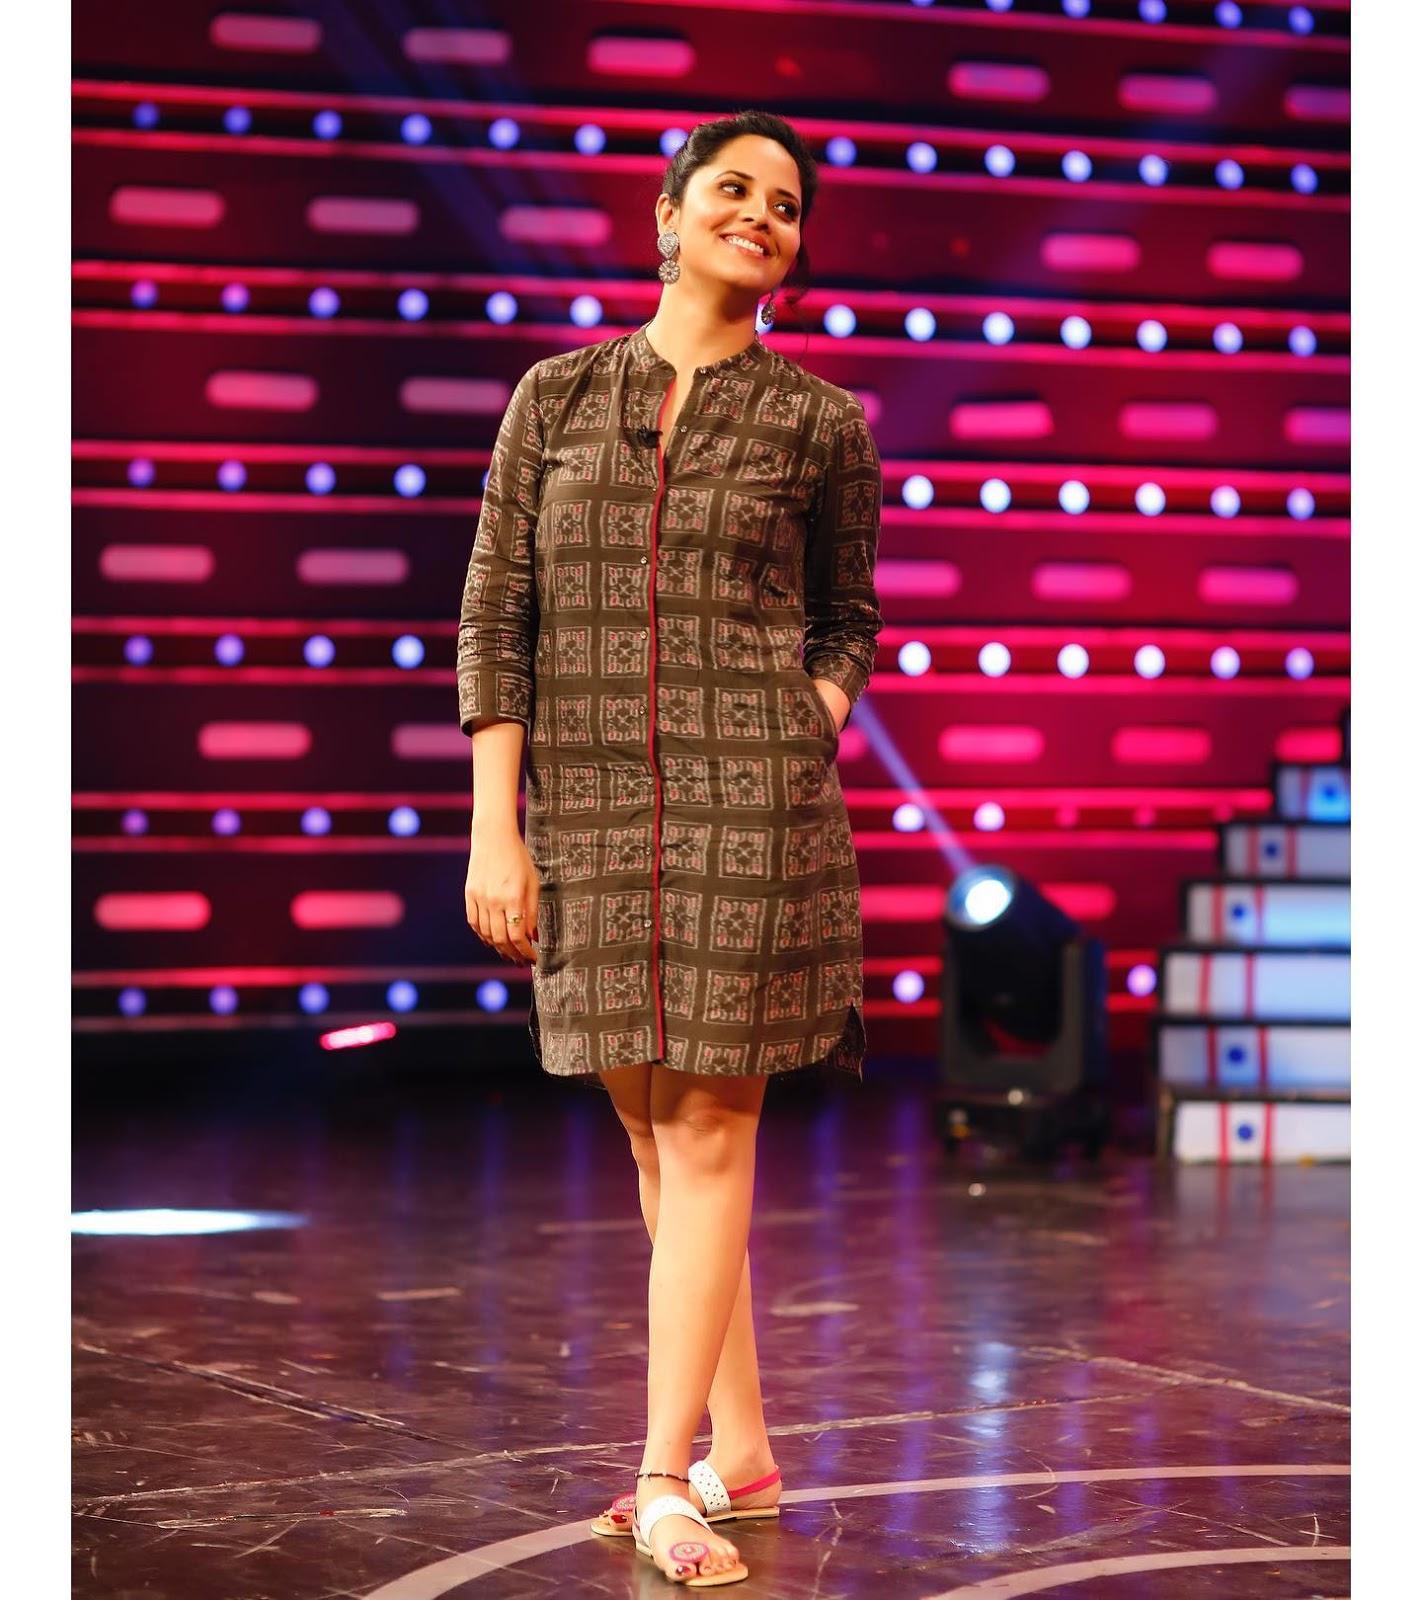 Indian TV Actress Anasuya Long Cross Legs In Black Skirt